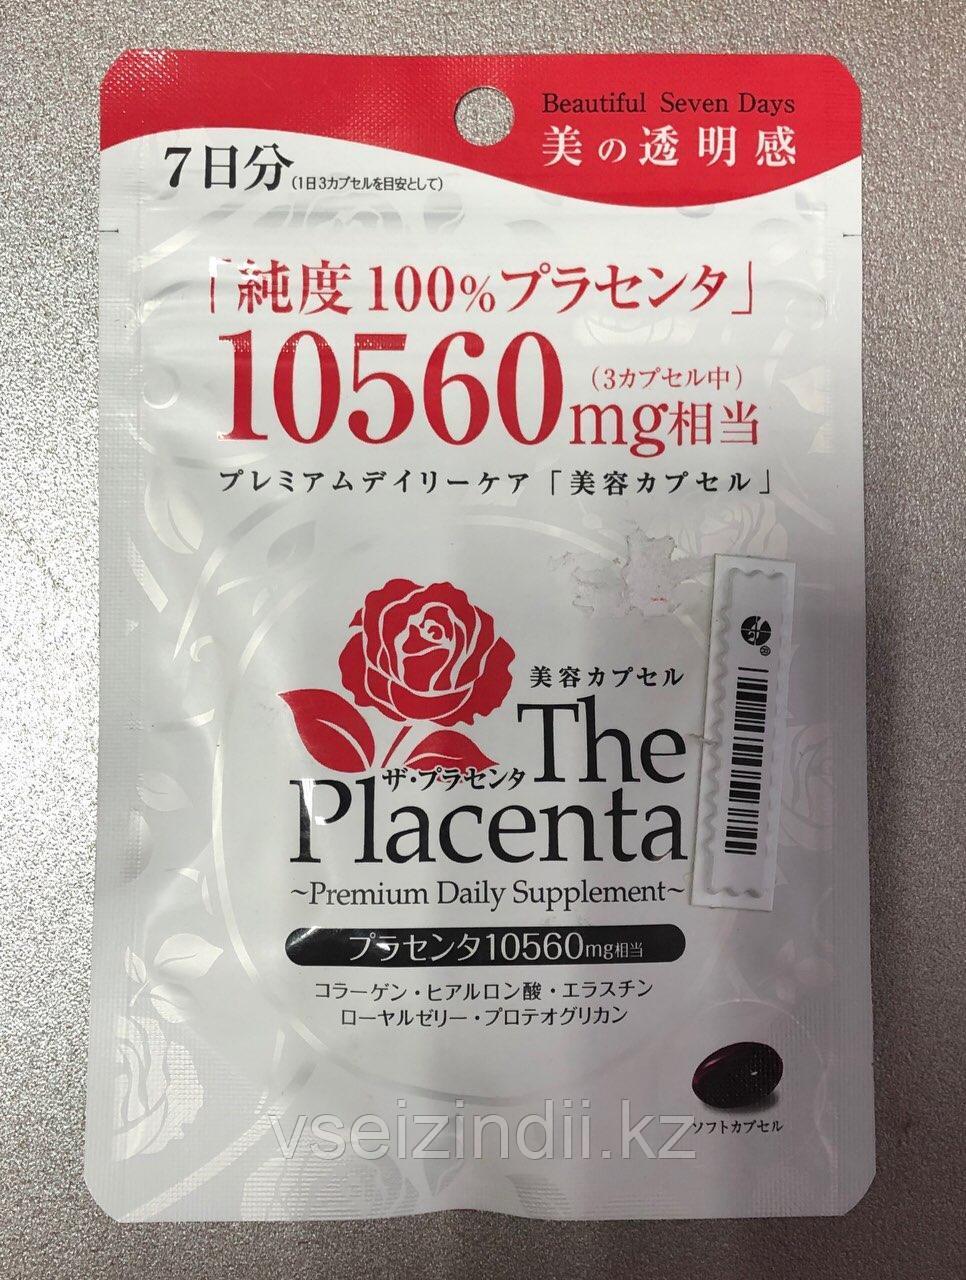 Пищевая добавка Экстракт плаценты, The Placenta, 10560 мг, на 7 дней.